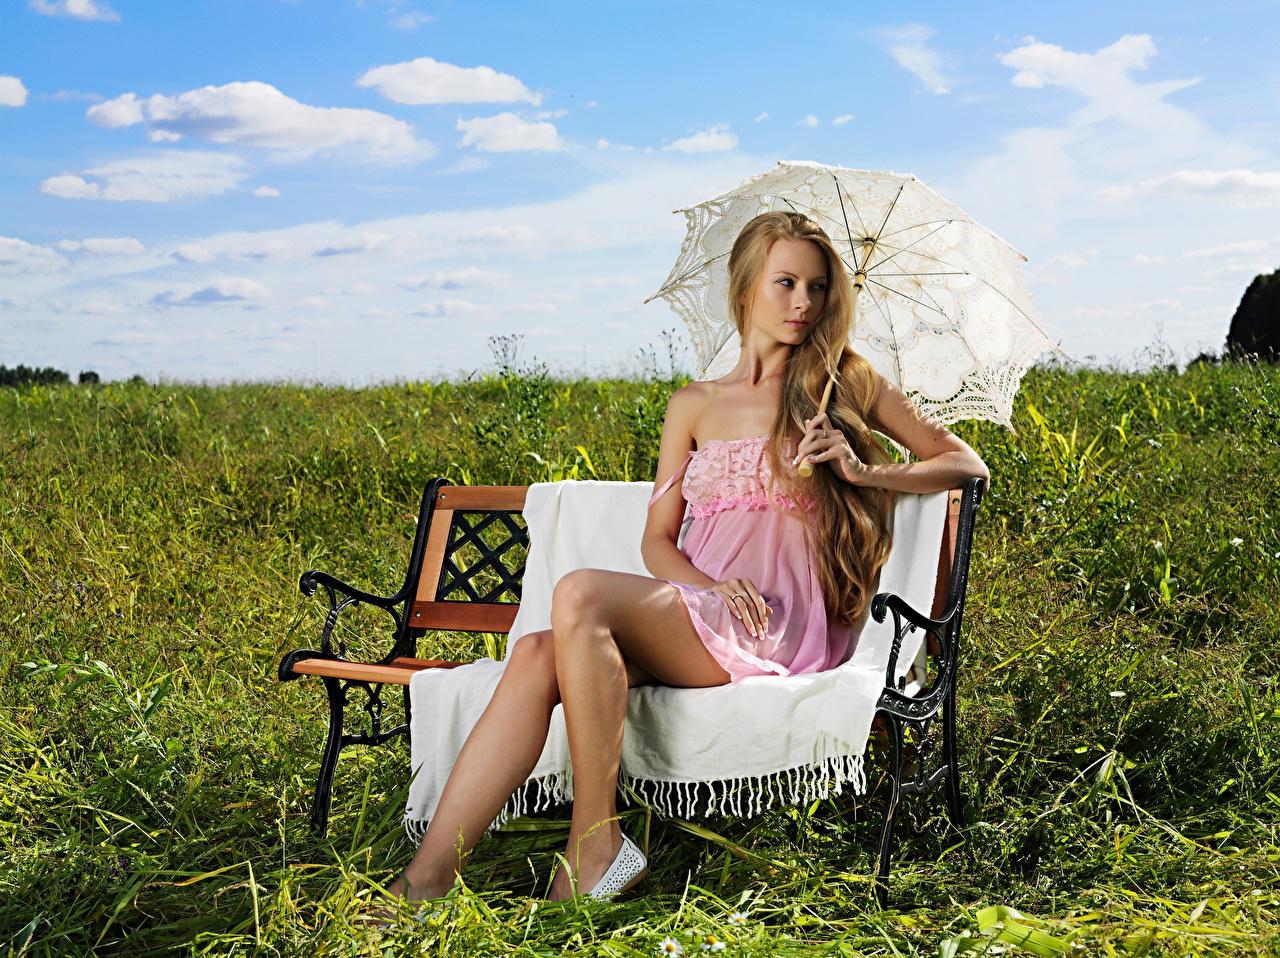 Photos Blonde girl Girls Summer Legs Grass Bench Sitting Umbrella female young woman sit parasol